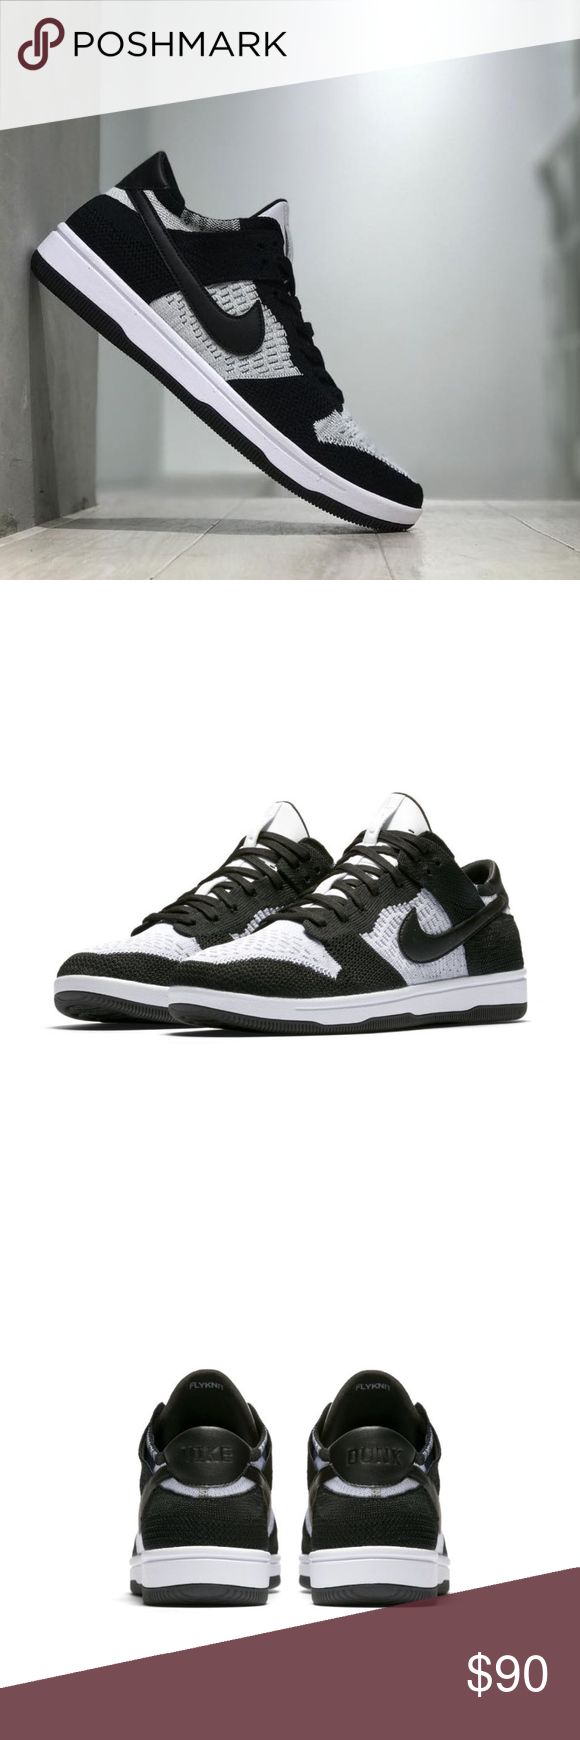 007e6f783505 Nike DUNK FLYKNIT Men s Shoe - OREO Black White The  80s icon gets a modern